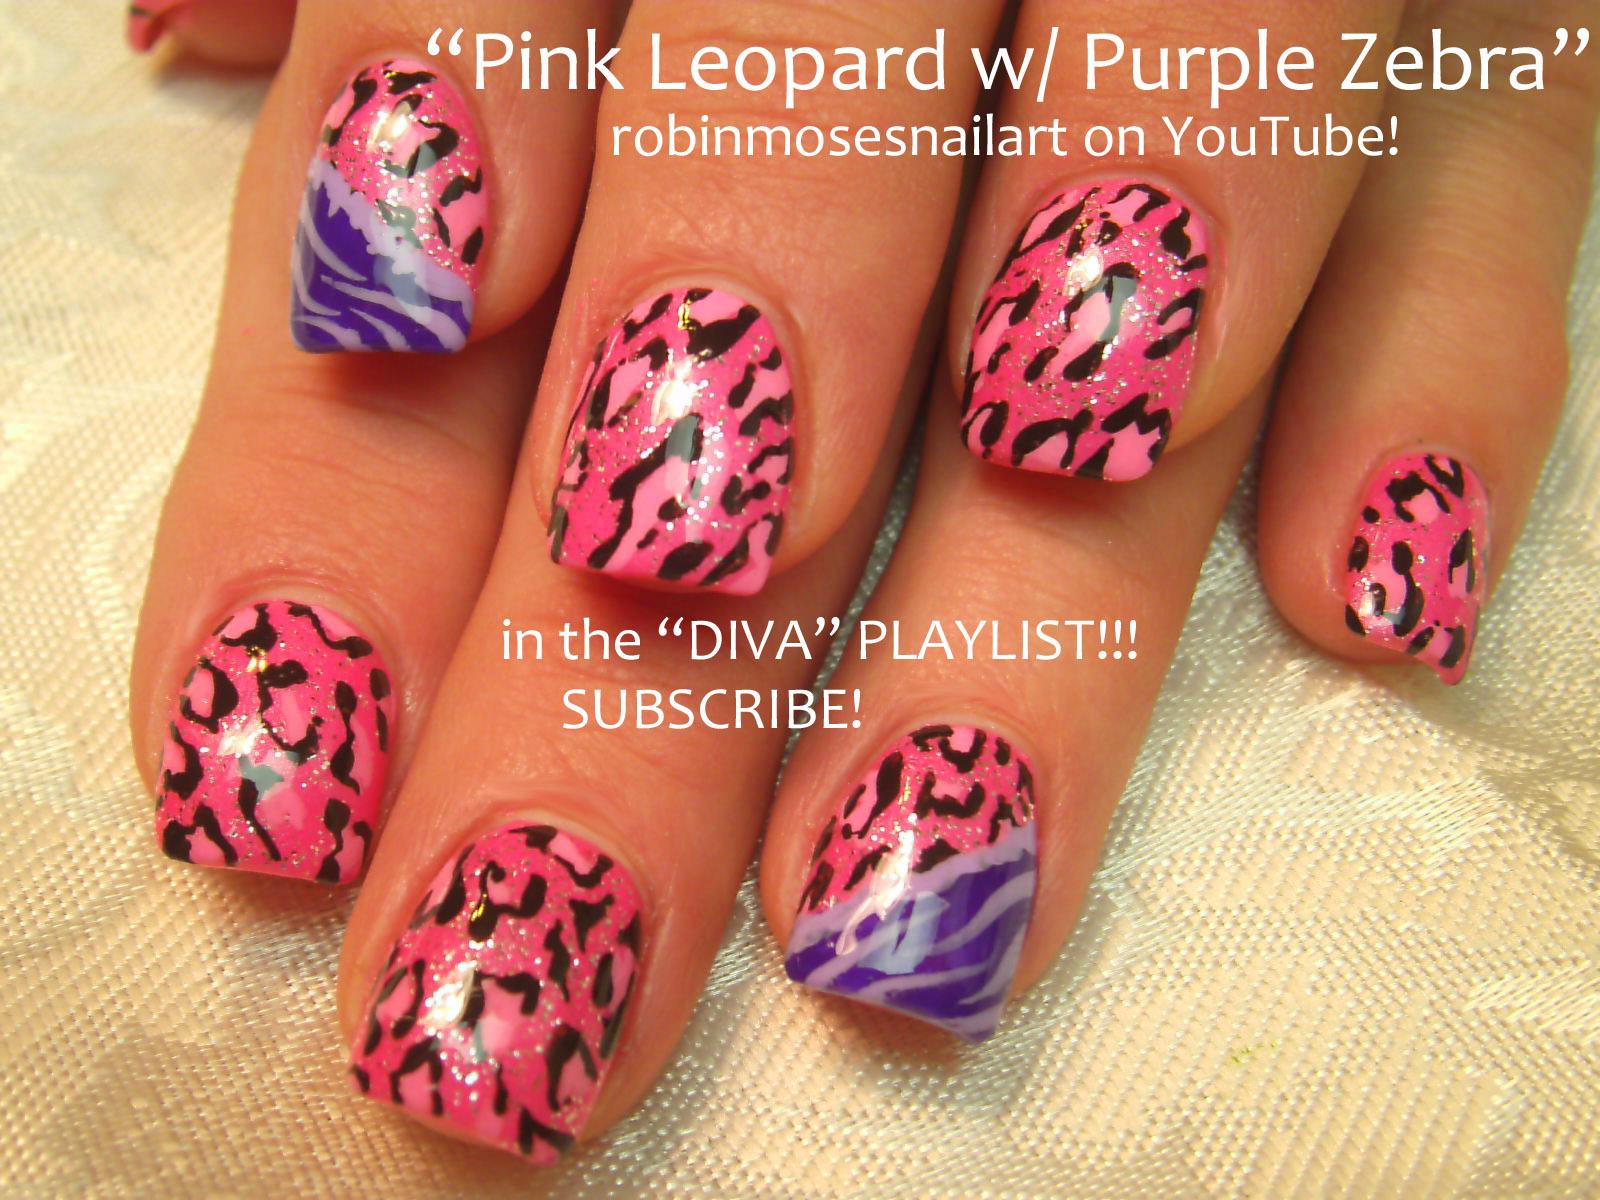 Pink and purple animal print see thru tights 5